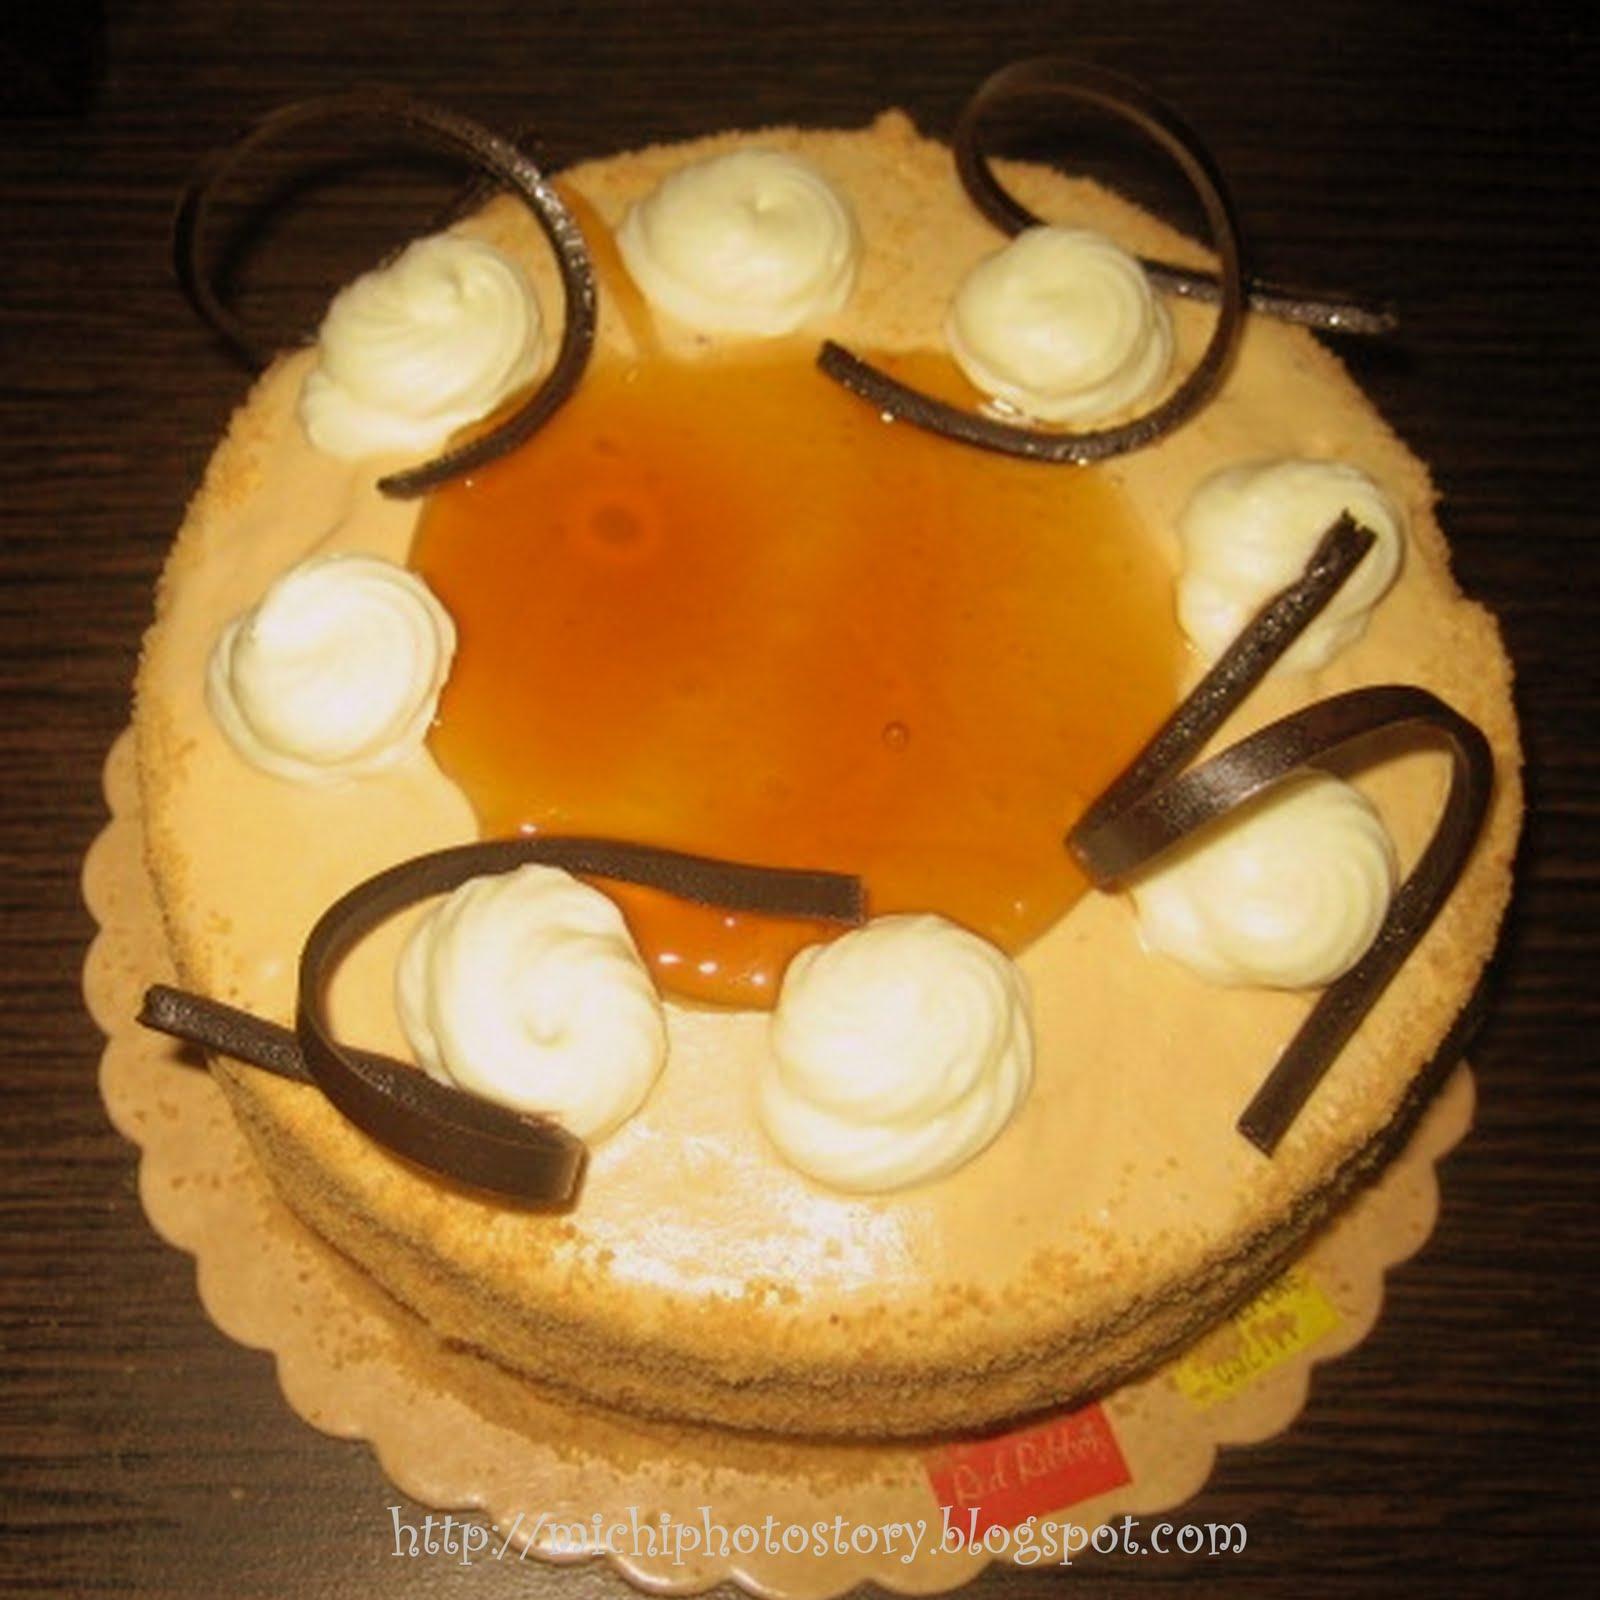 Michi Photostory Dulce De Leche Cake